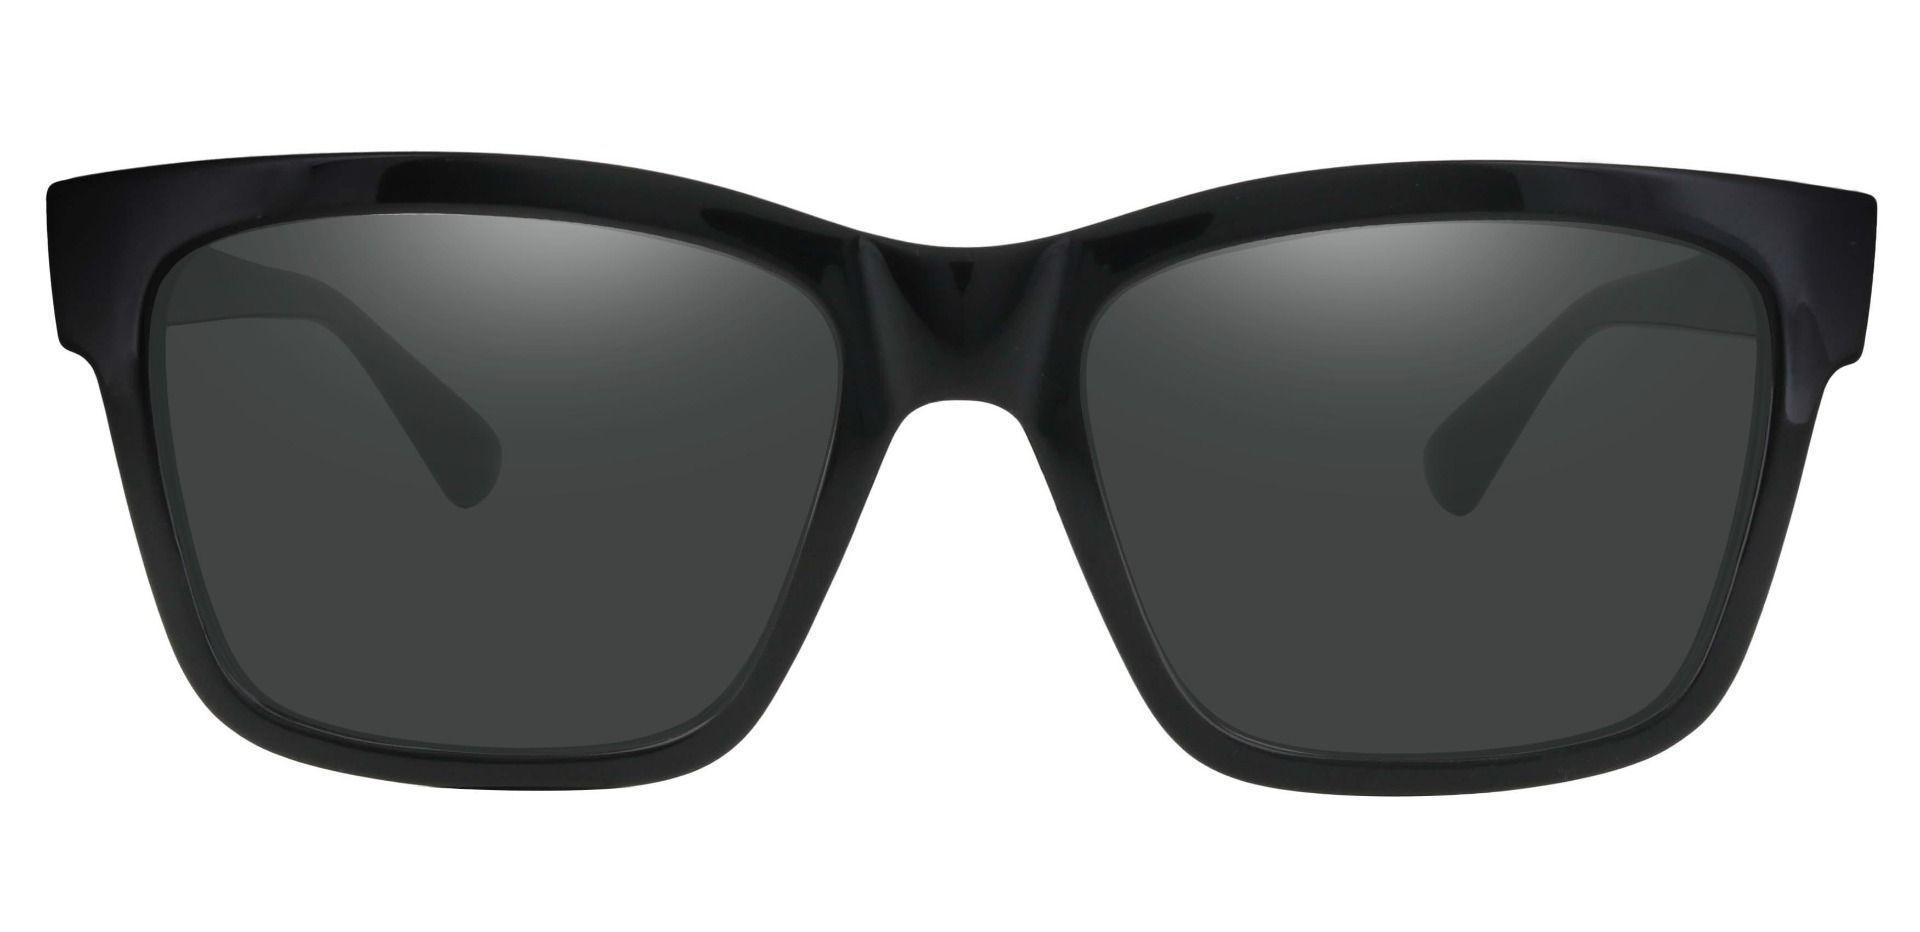 Brinley Square Progressive Sunglasses - Black Frame With Gray Lenses